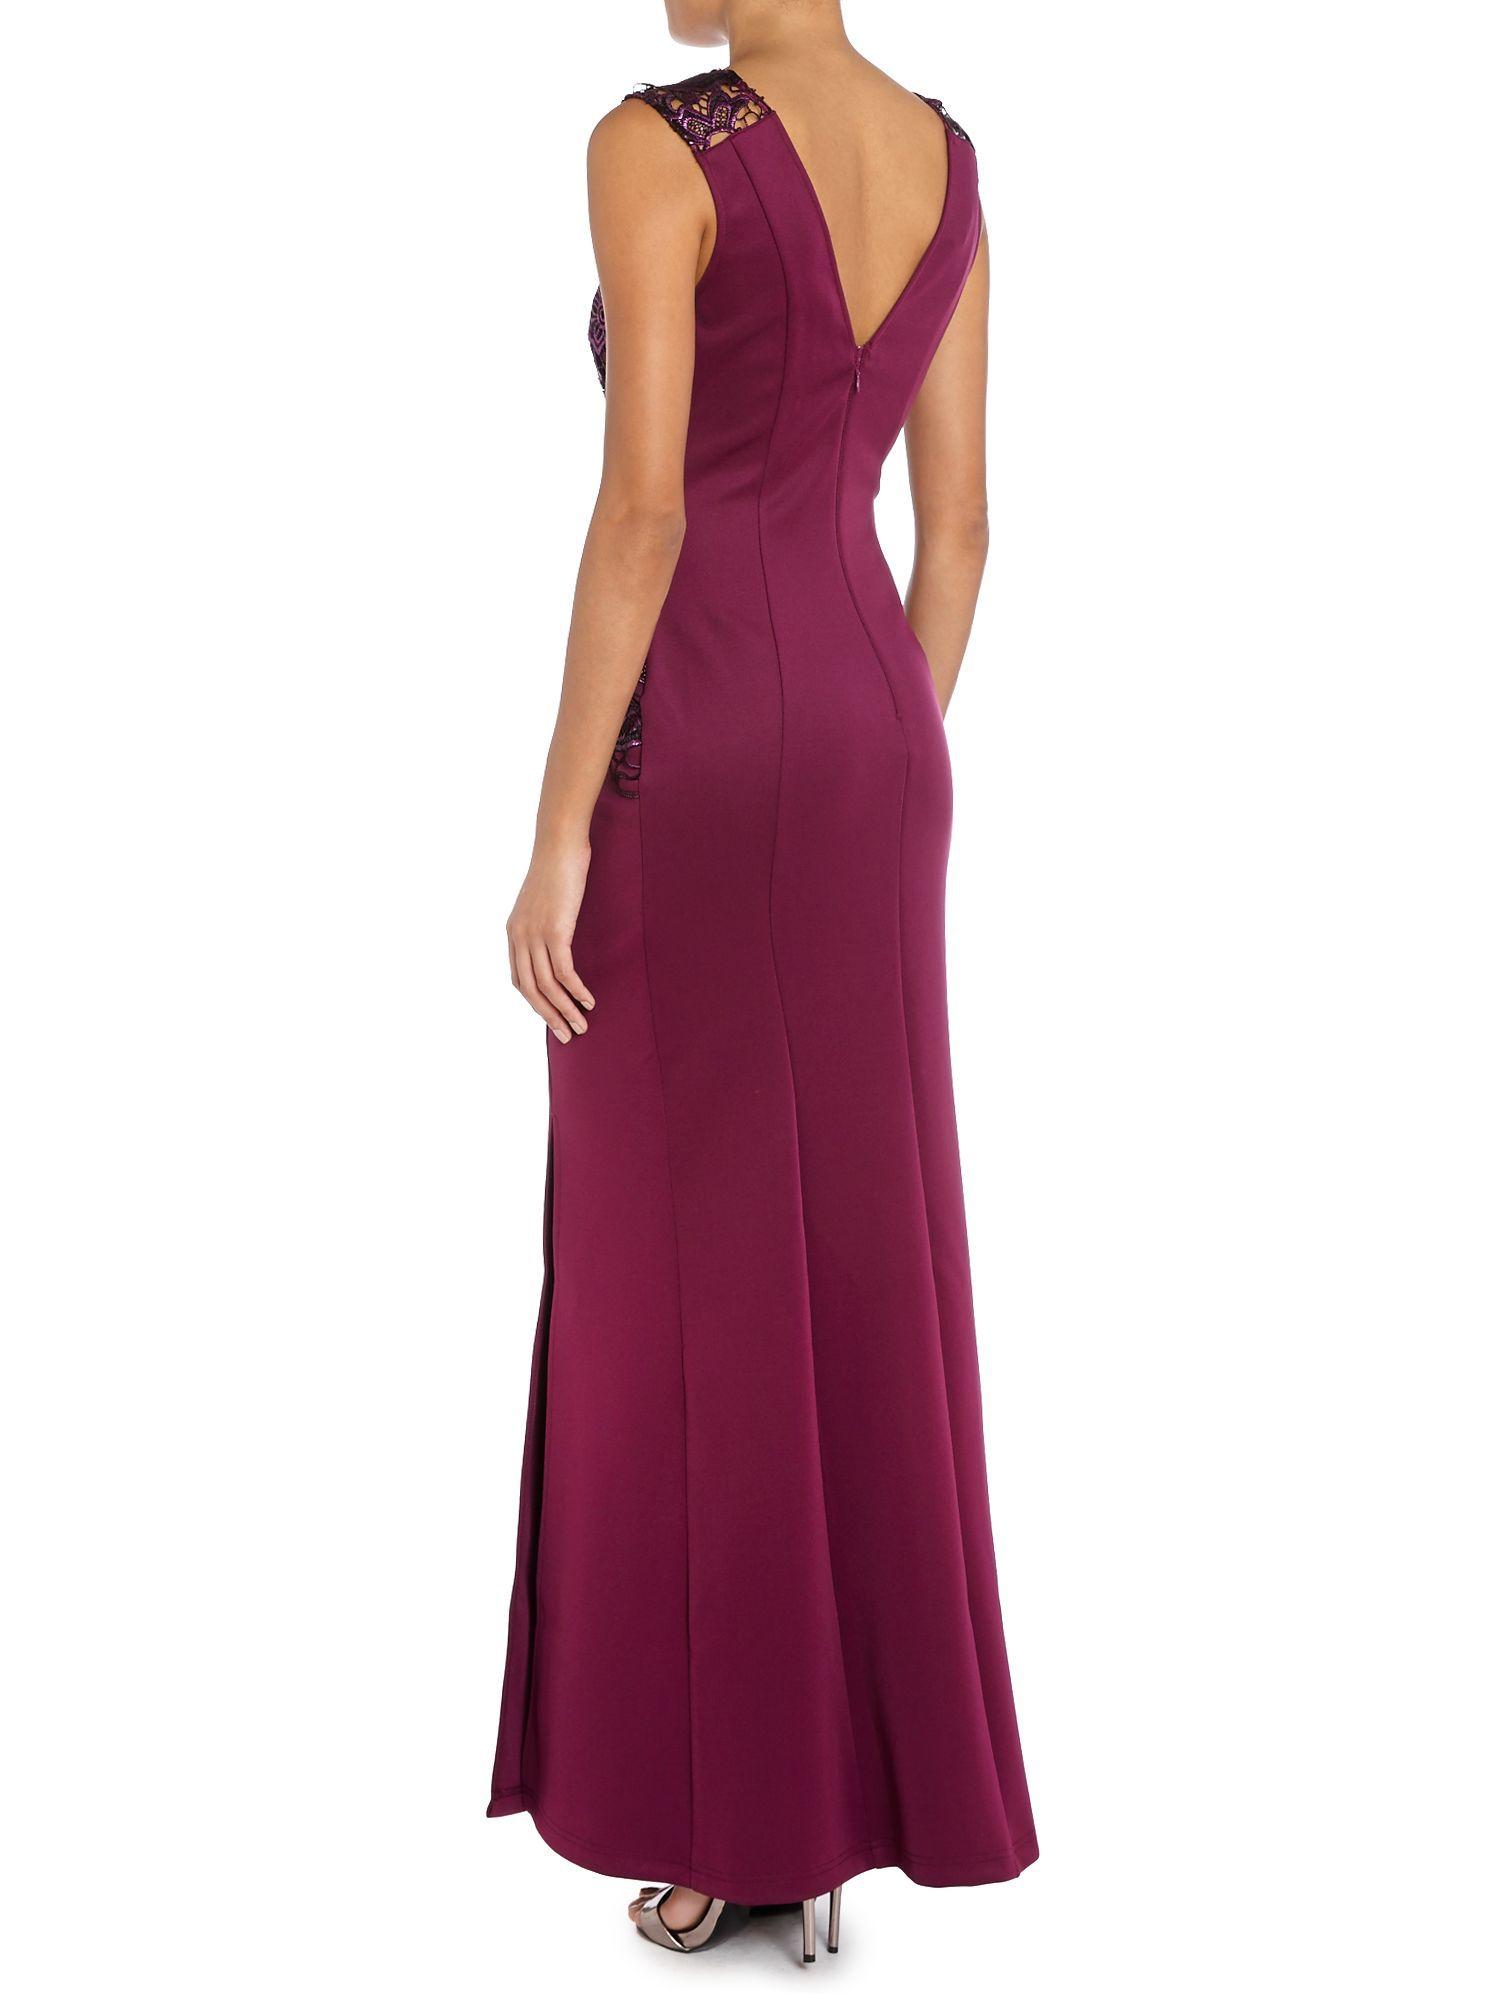 Lipsy dresses shop for lipsy dresses on polyvore maxi dresses